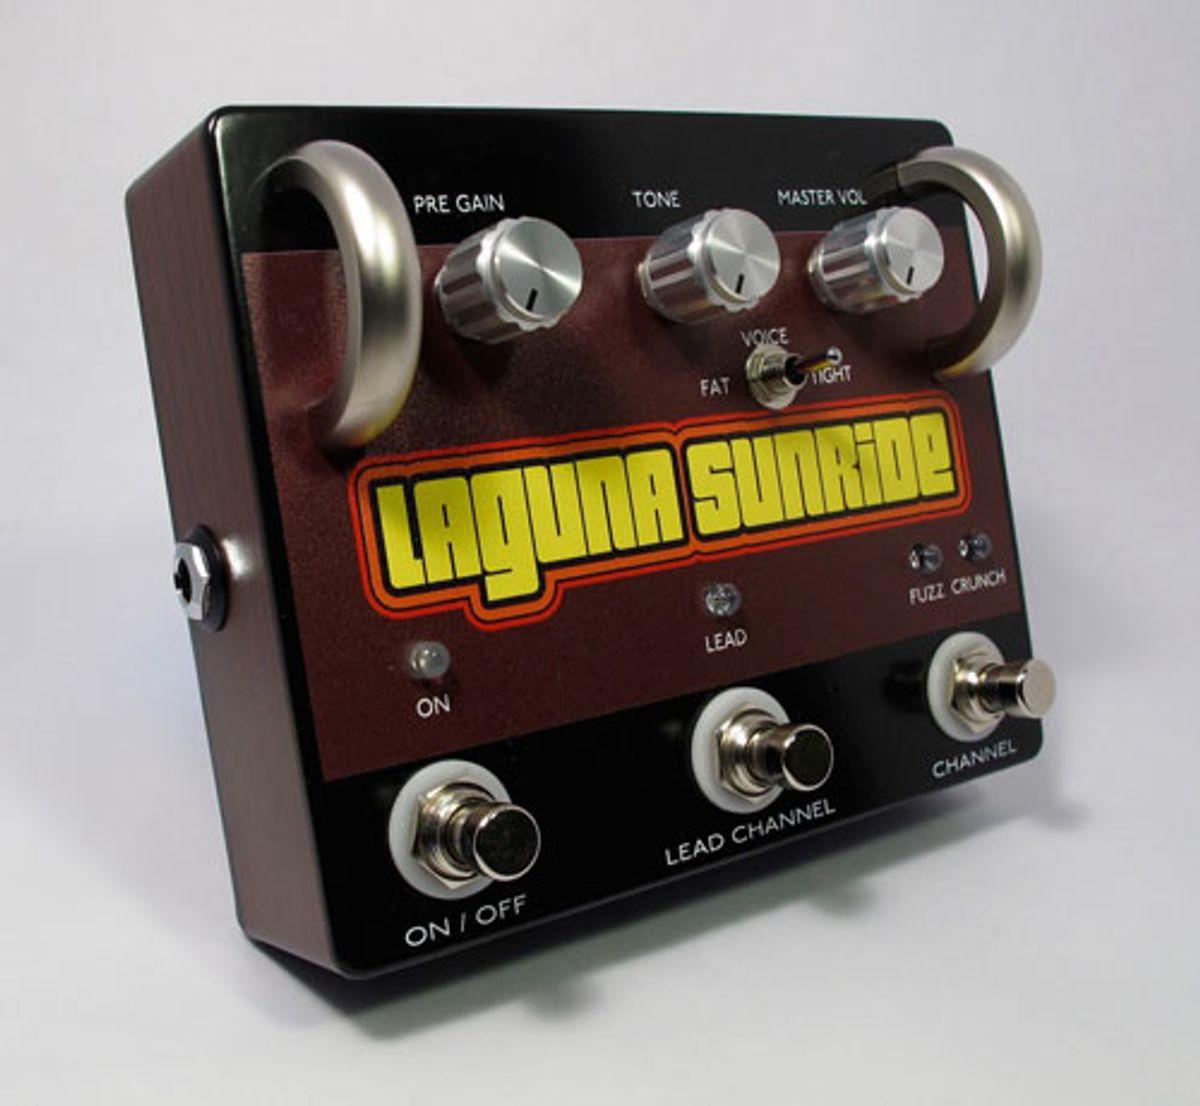 Hovercraft Introduces the Laguna Sunride